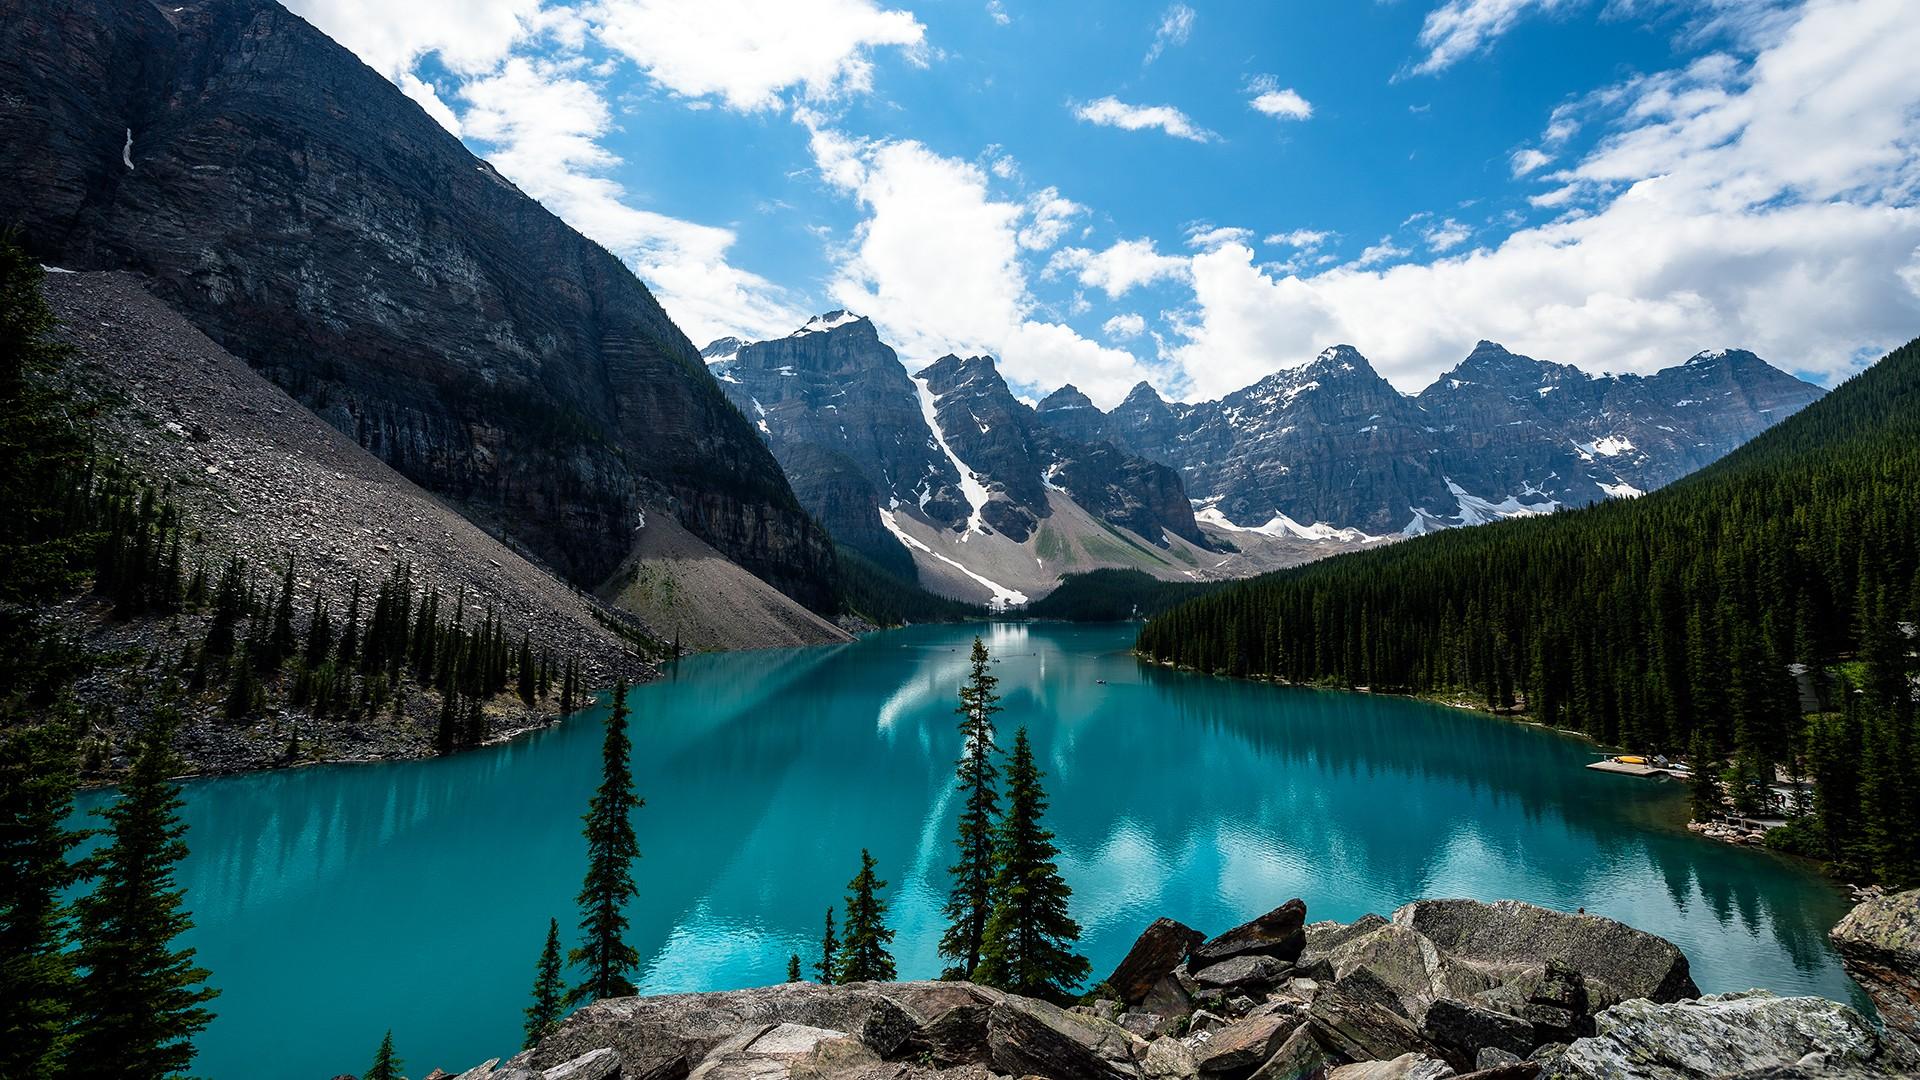 canada-moraine-lake-fresh-new-hd-wallpaper